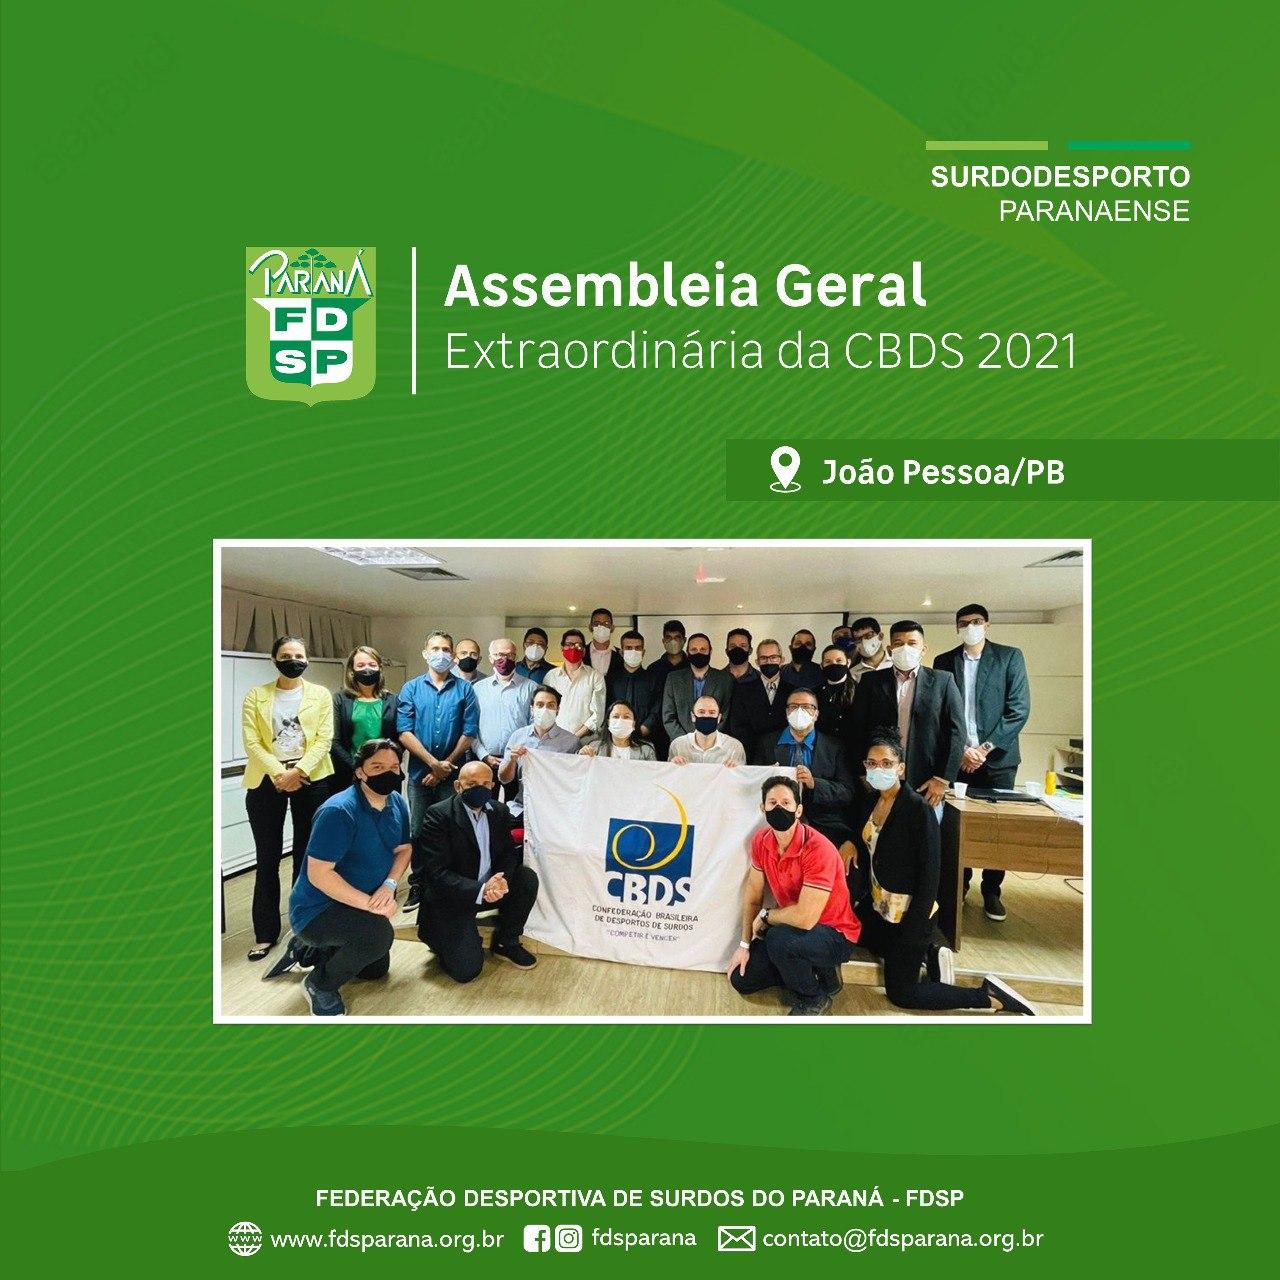 Assembelia